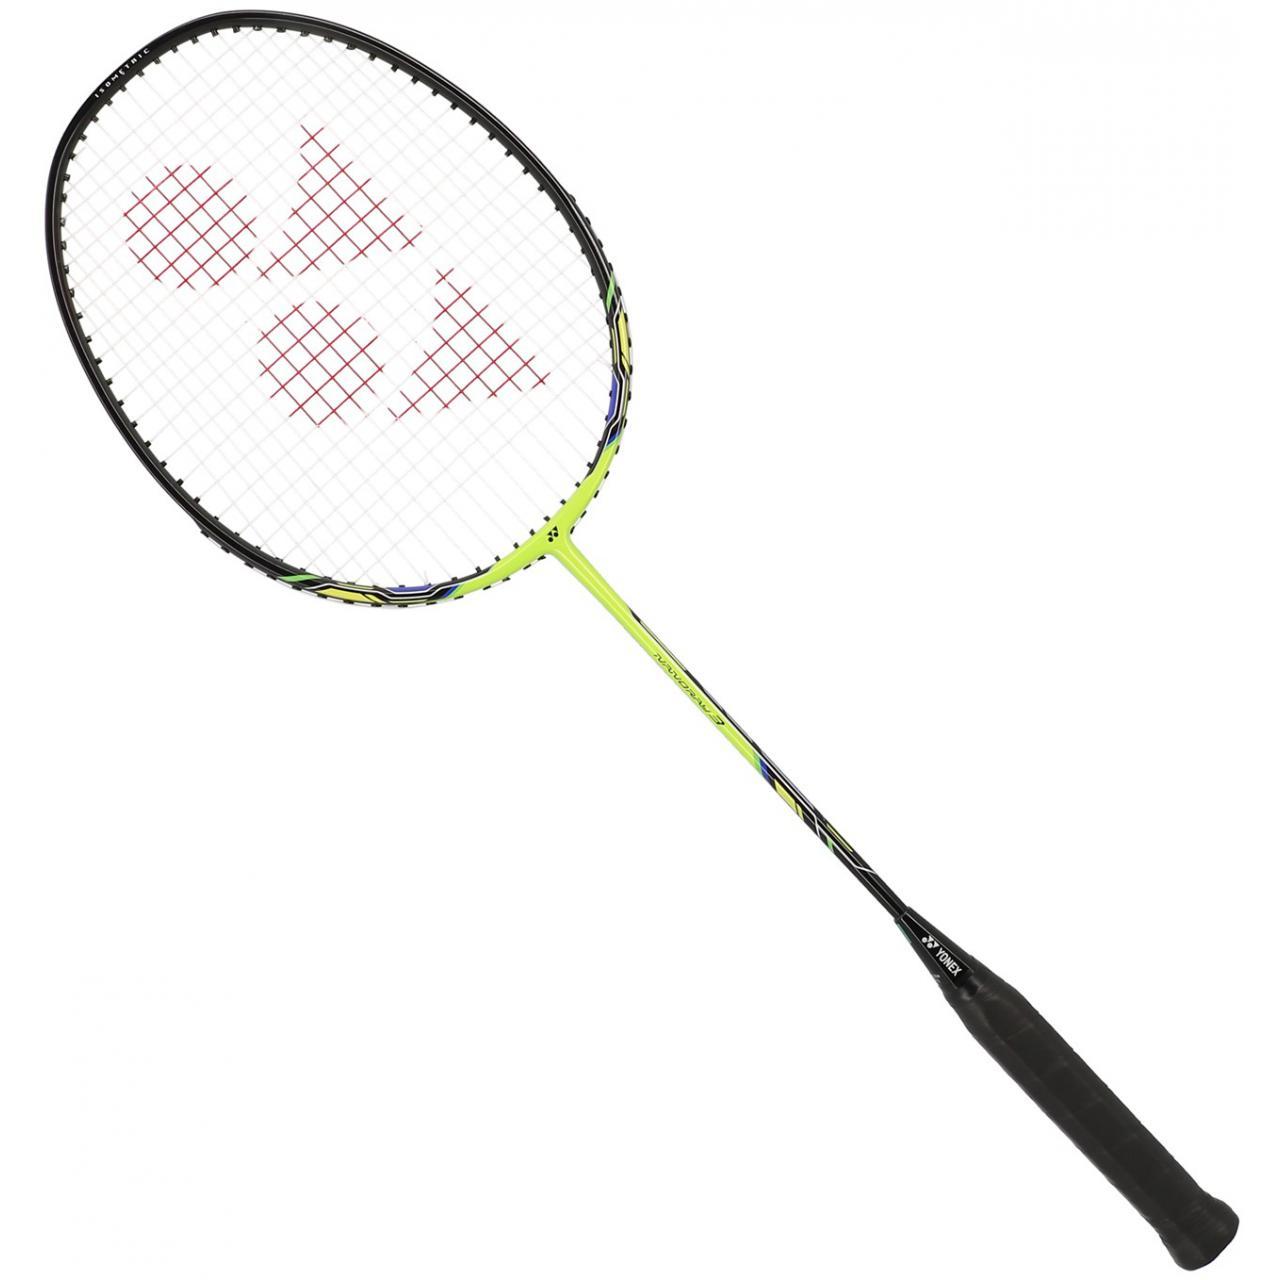 Badminton-Racket-Yonex-Nanoray-3-3u4-Lime-Badminton-Yellow-91913-New thumbnail 5